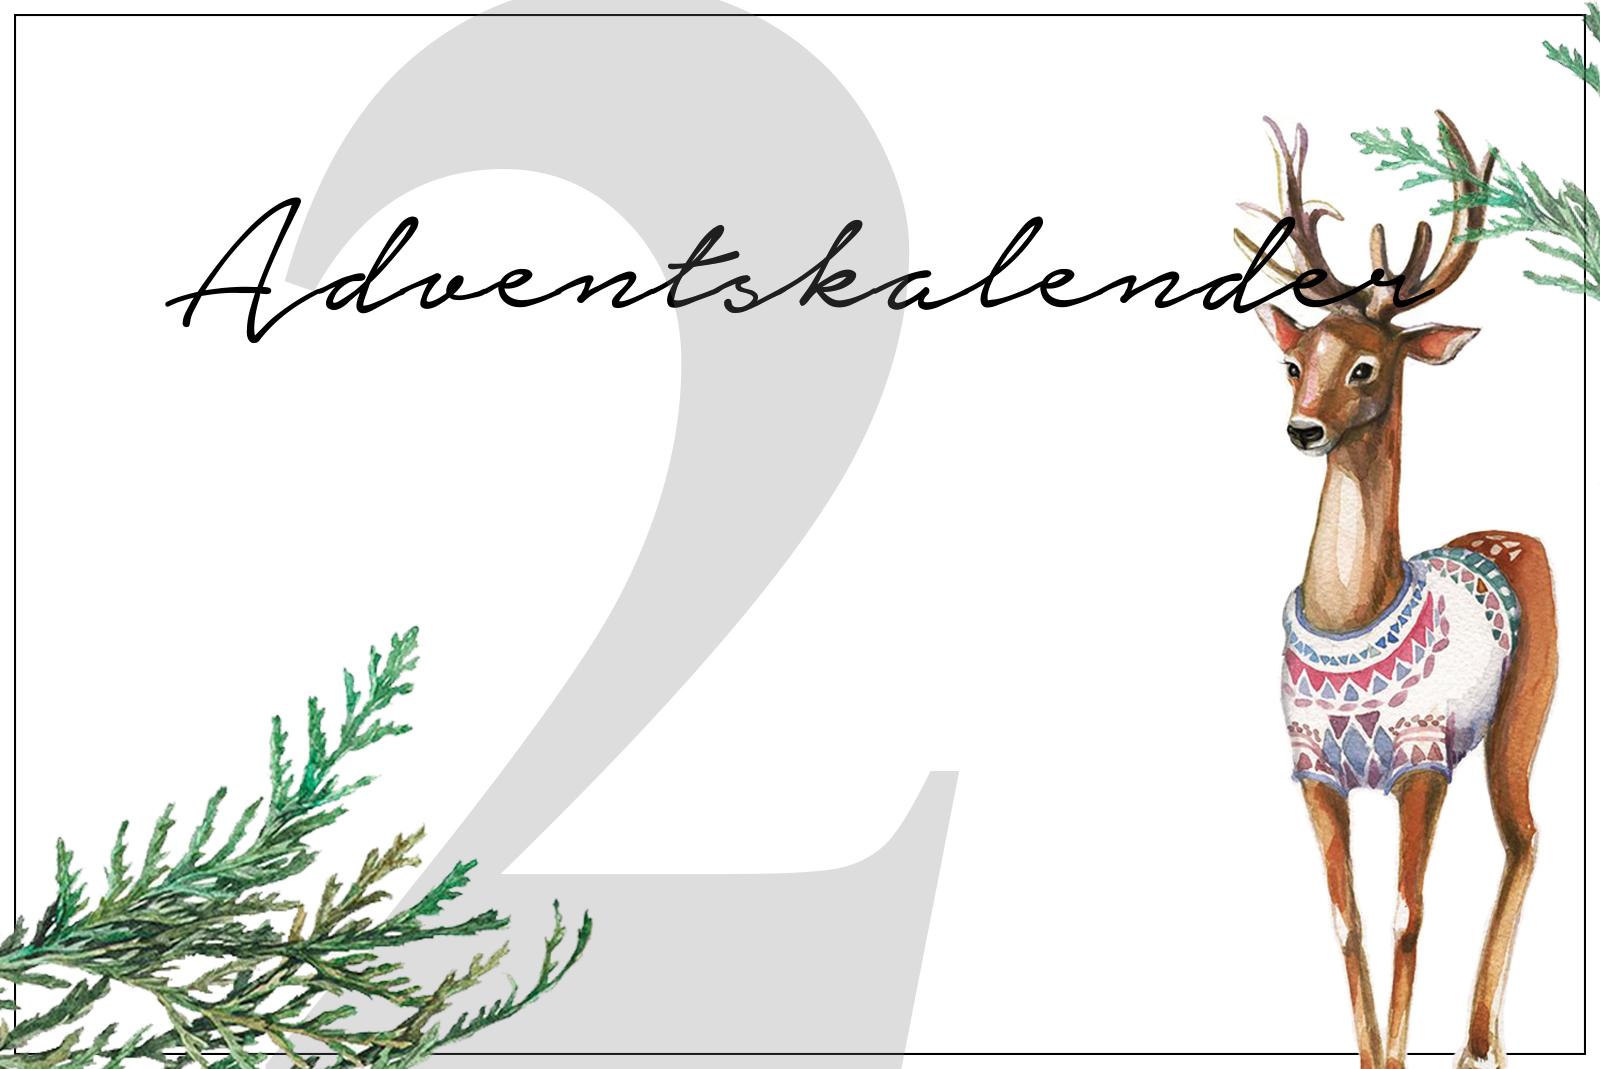 adventskalender-2016-2